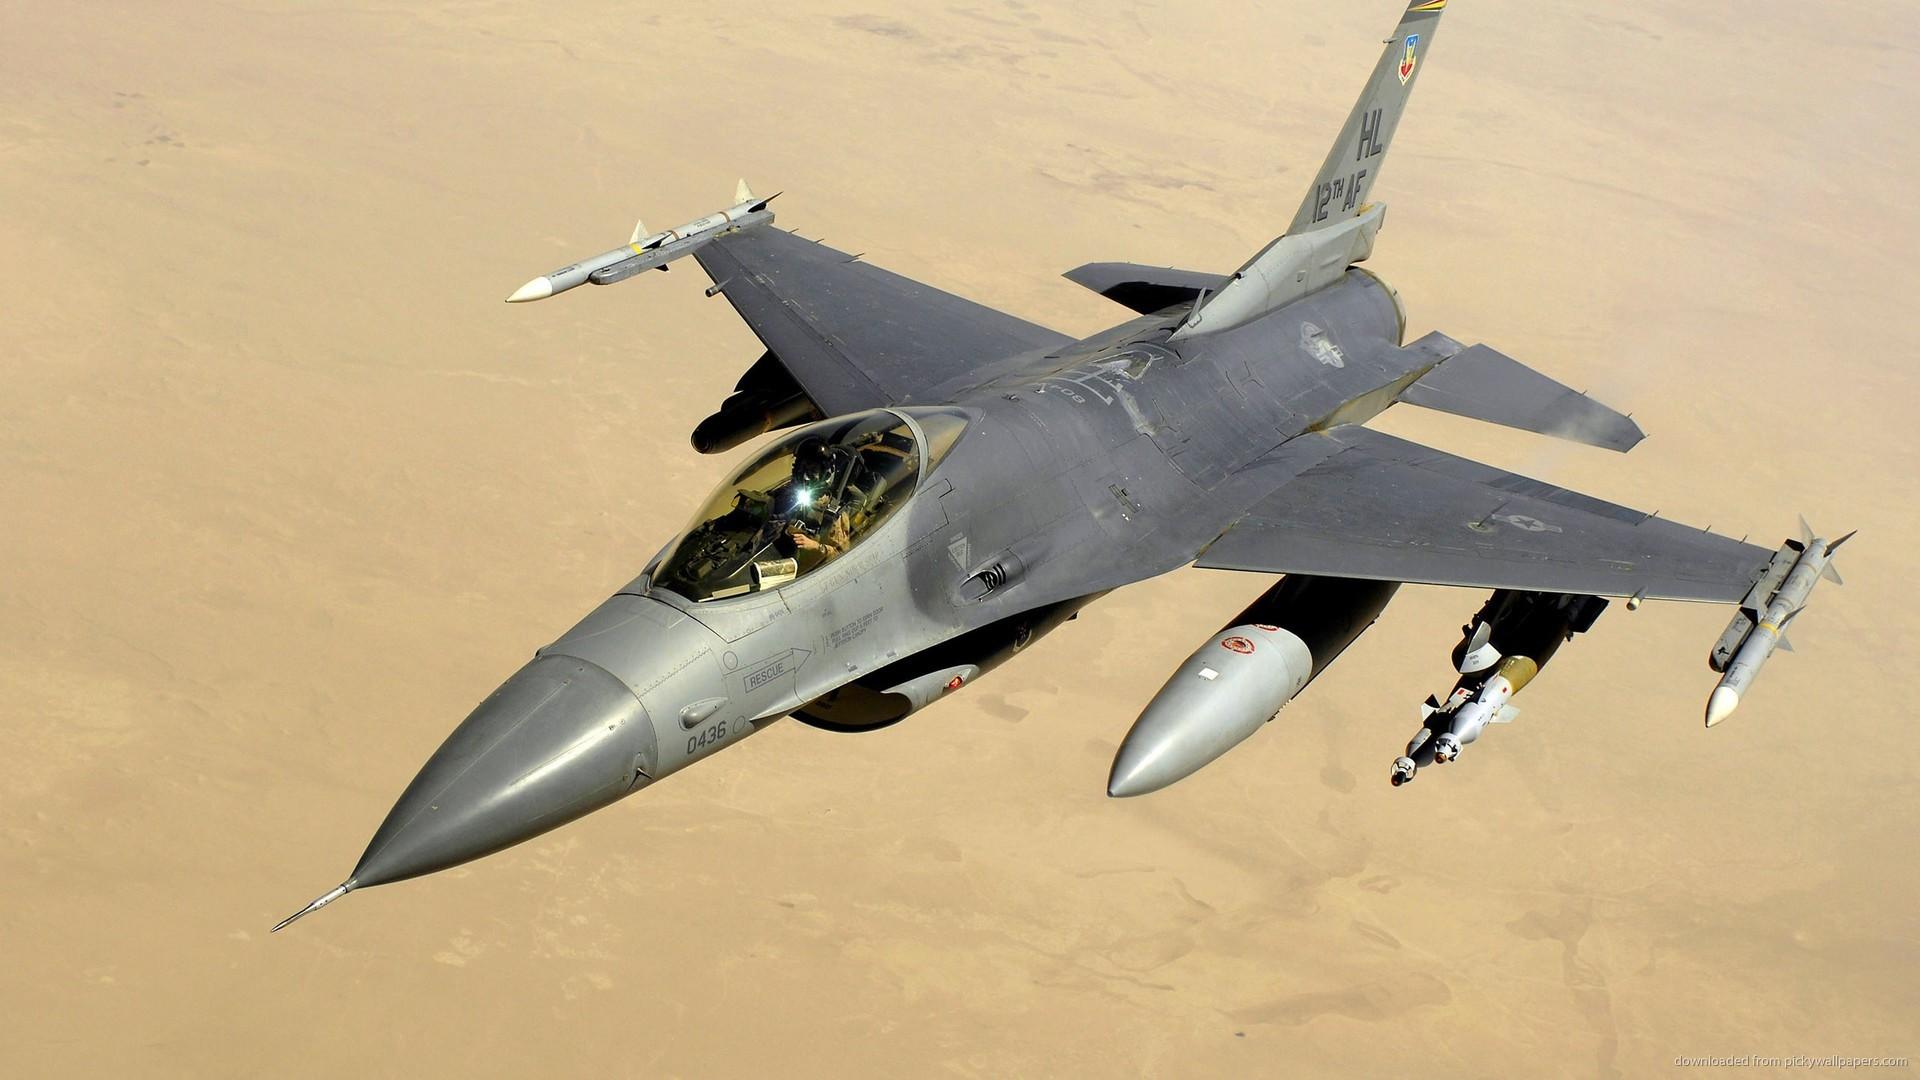 2560×1440 F-16 Fighting Falcon Over The Desert wallpaper